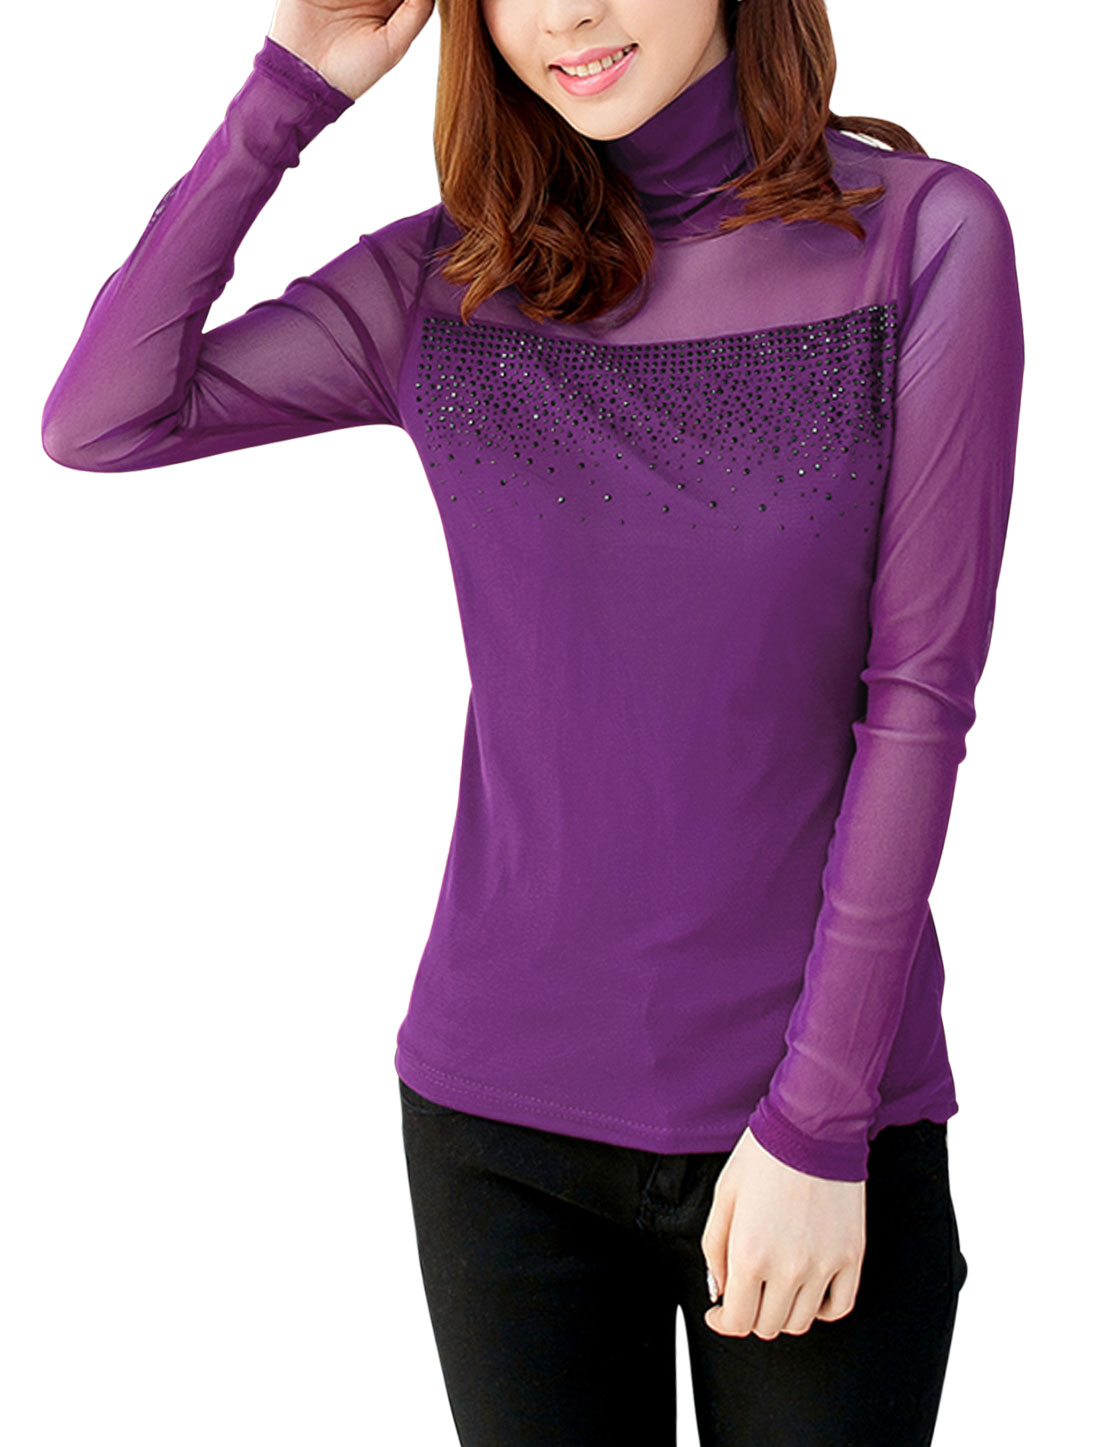 Lady Turtle Neck Semi Sheer Yoke w Sleeve Stretch Top Purple M